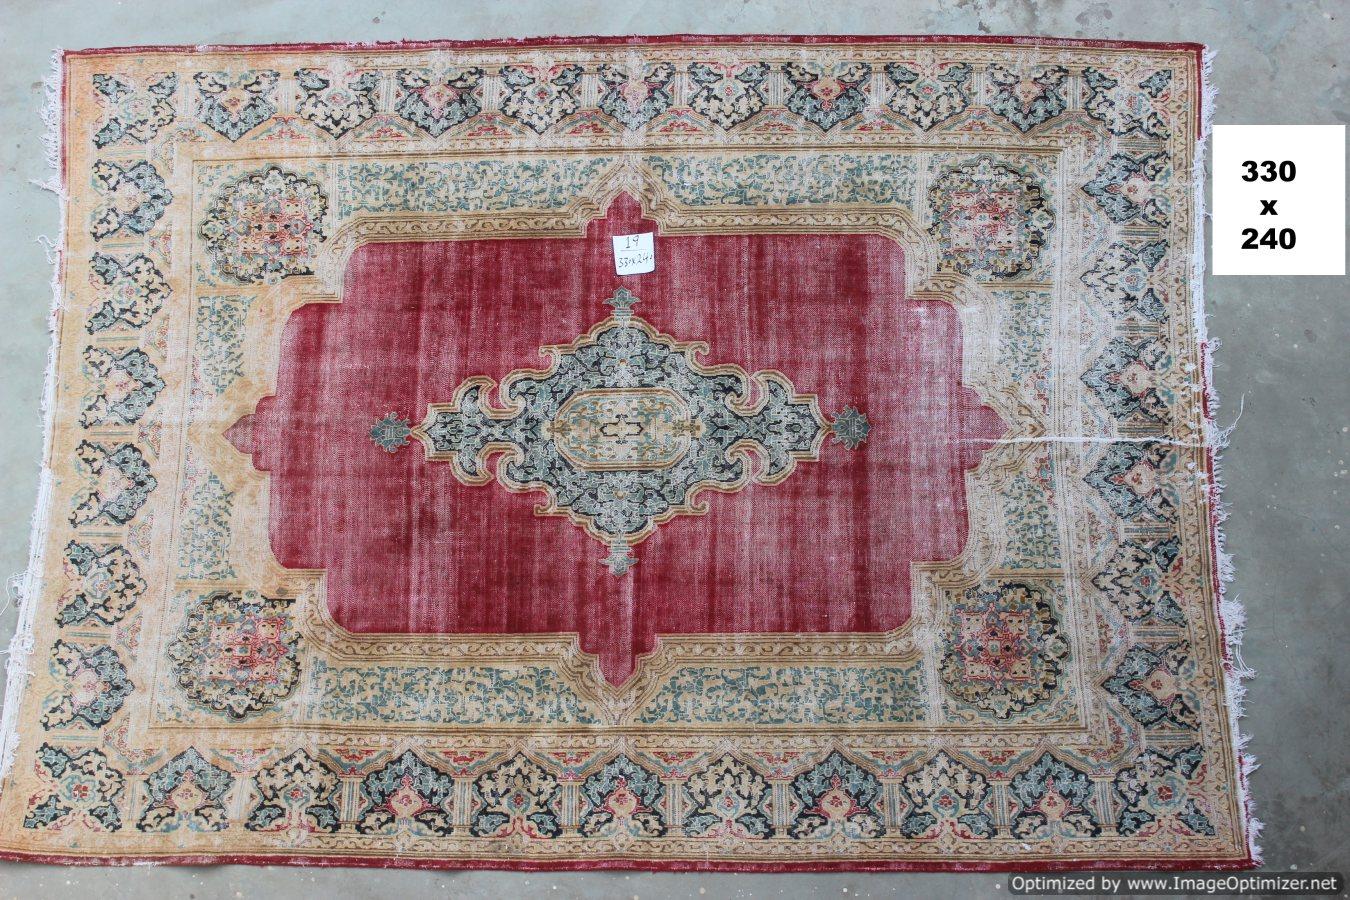 Vintage recoloured perzisch tapijt 19B (330cm x 240cm)